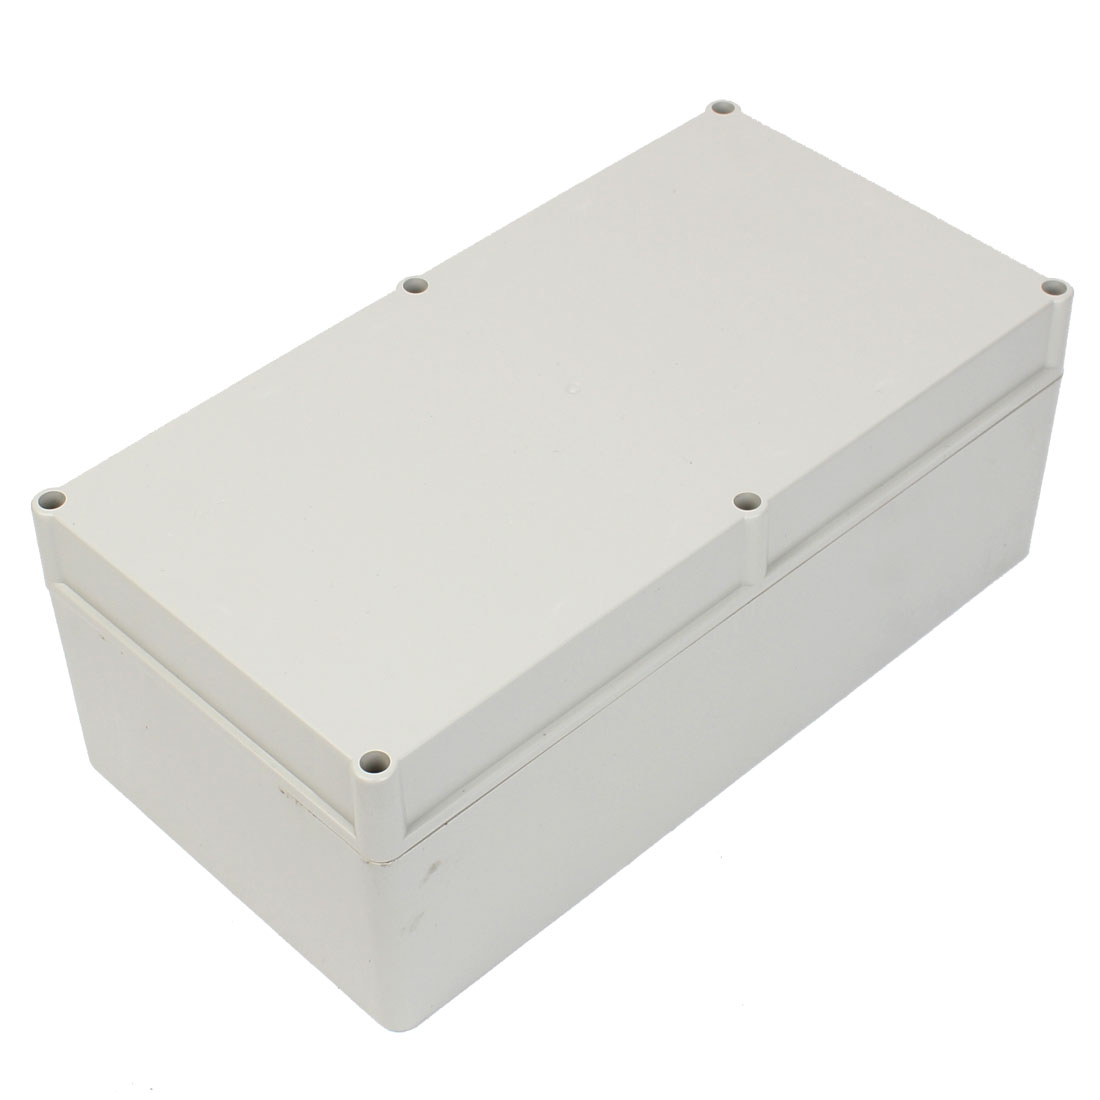 Rectangular Waterproof Plastic DIY Junction Box Case 290mmx150mmx110mm